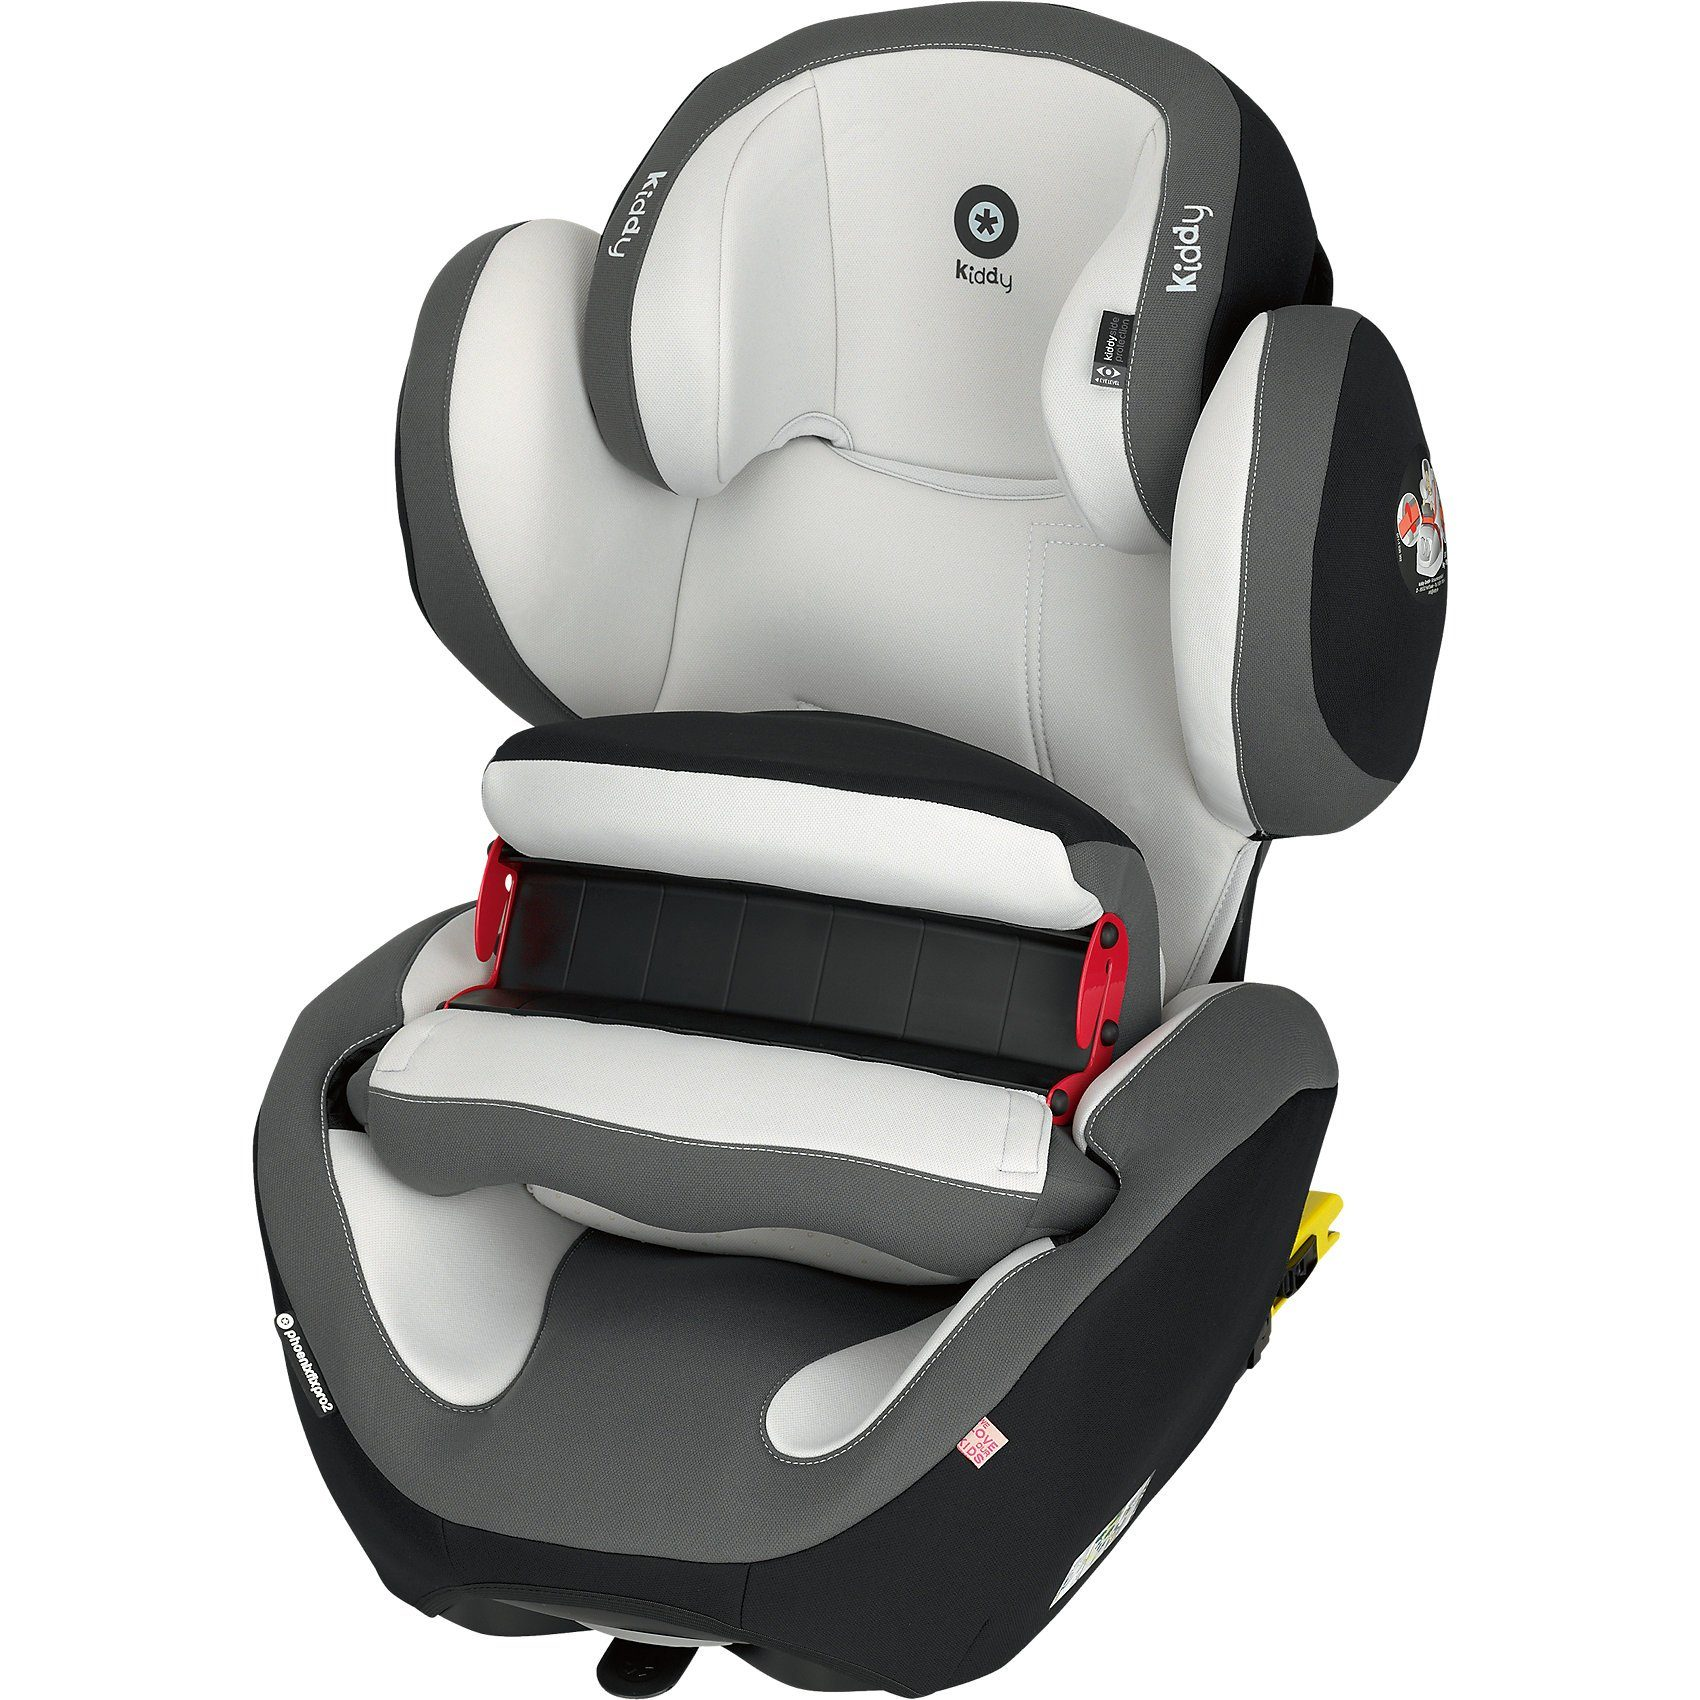 Kiddy Auto-Kindersitz Phoenixfix Pro 2, Silverstone, 2016